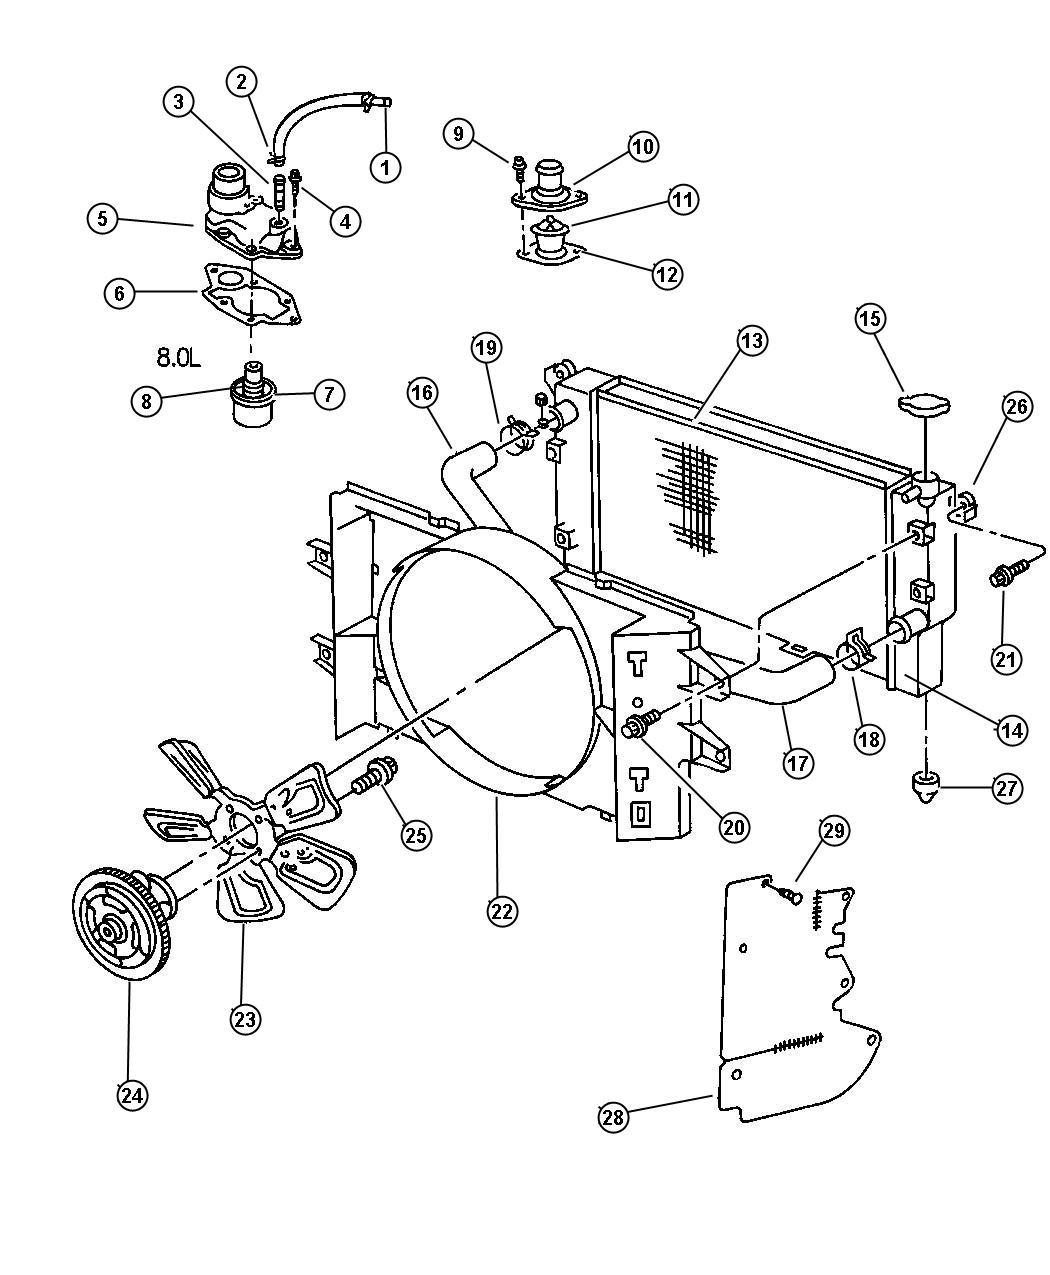 Engine Diagram Pcv Valve Location 2007 Saab 9 3 Engine Air Filter